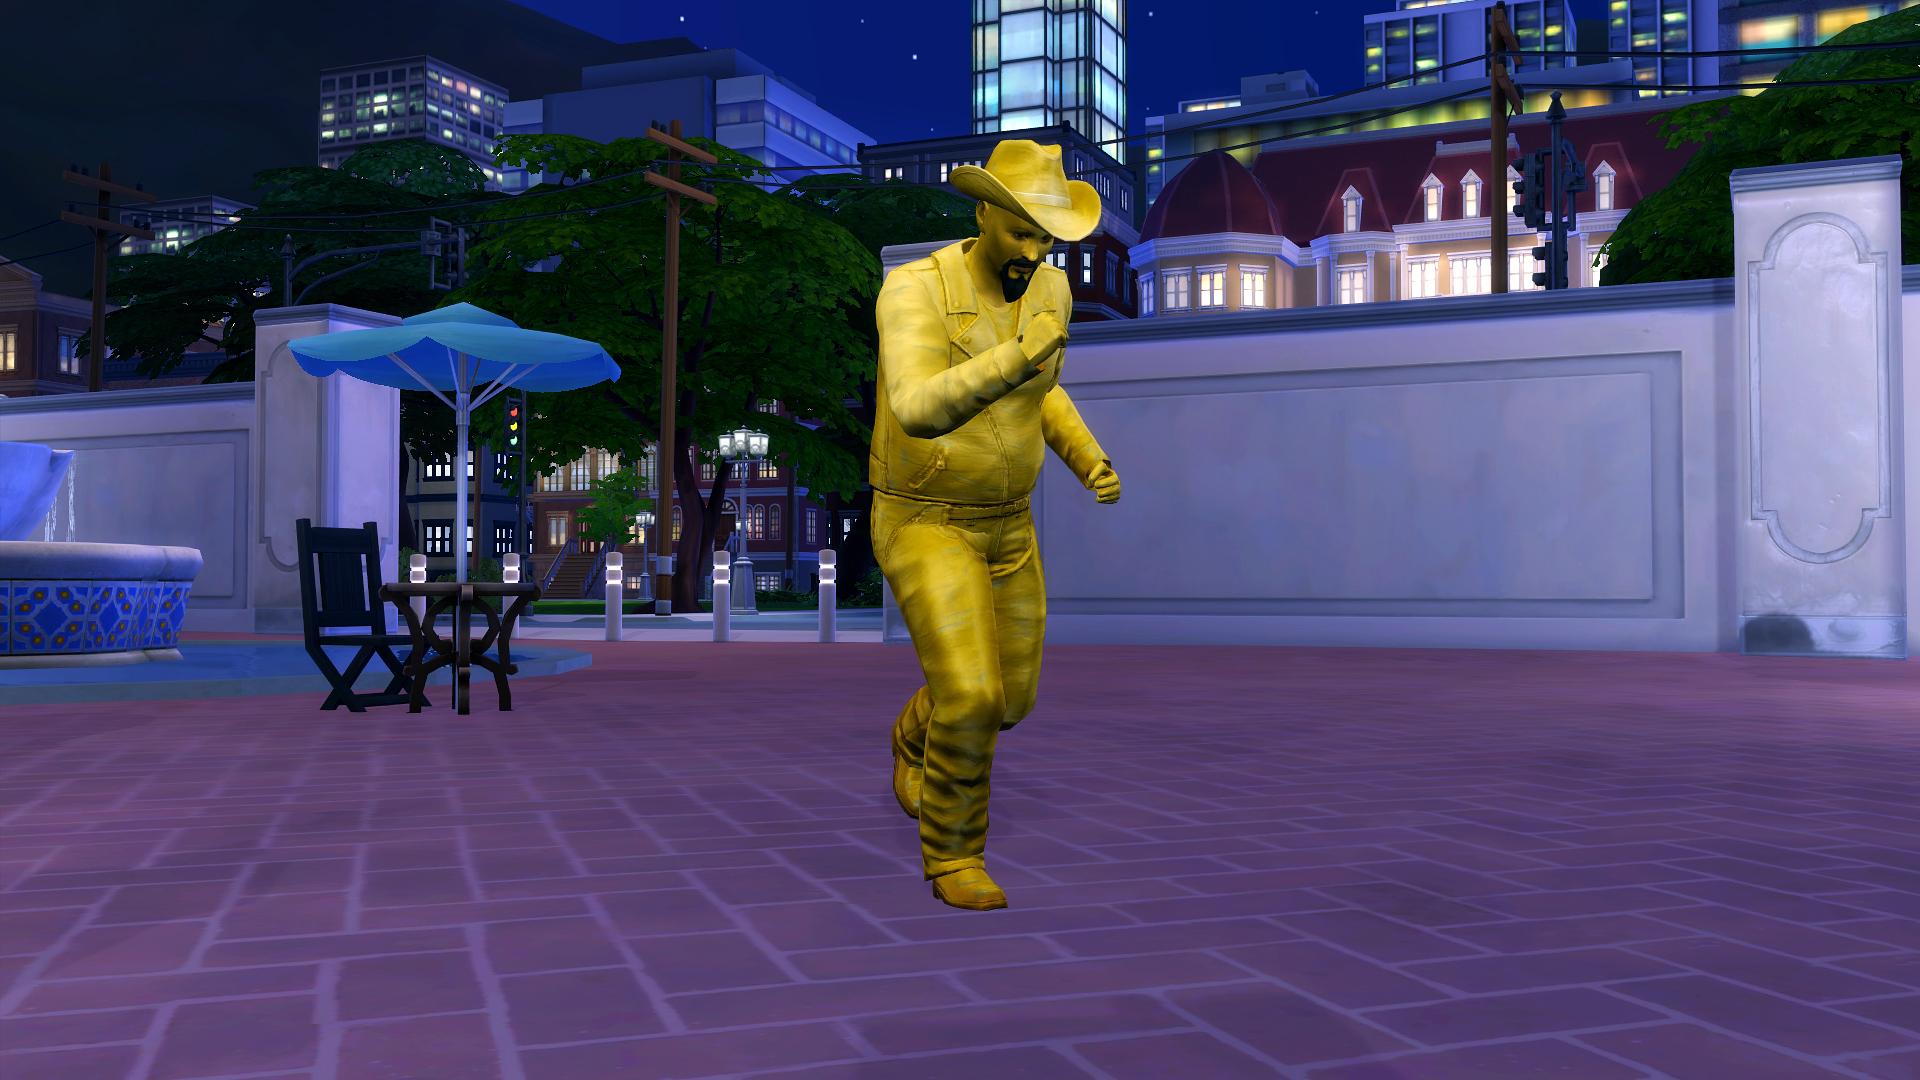 Living-Statue.jpg